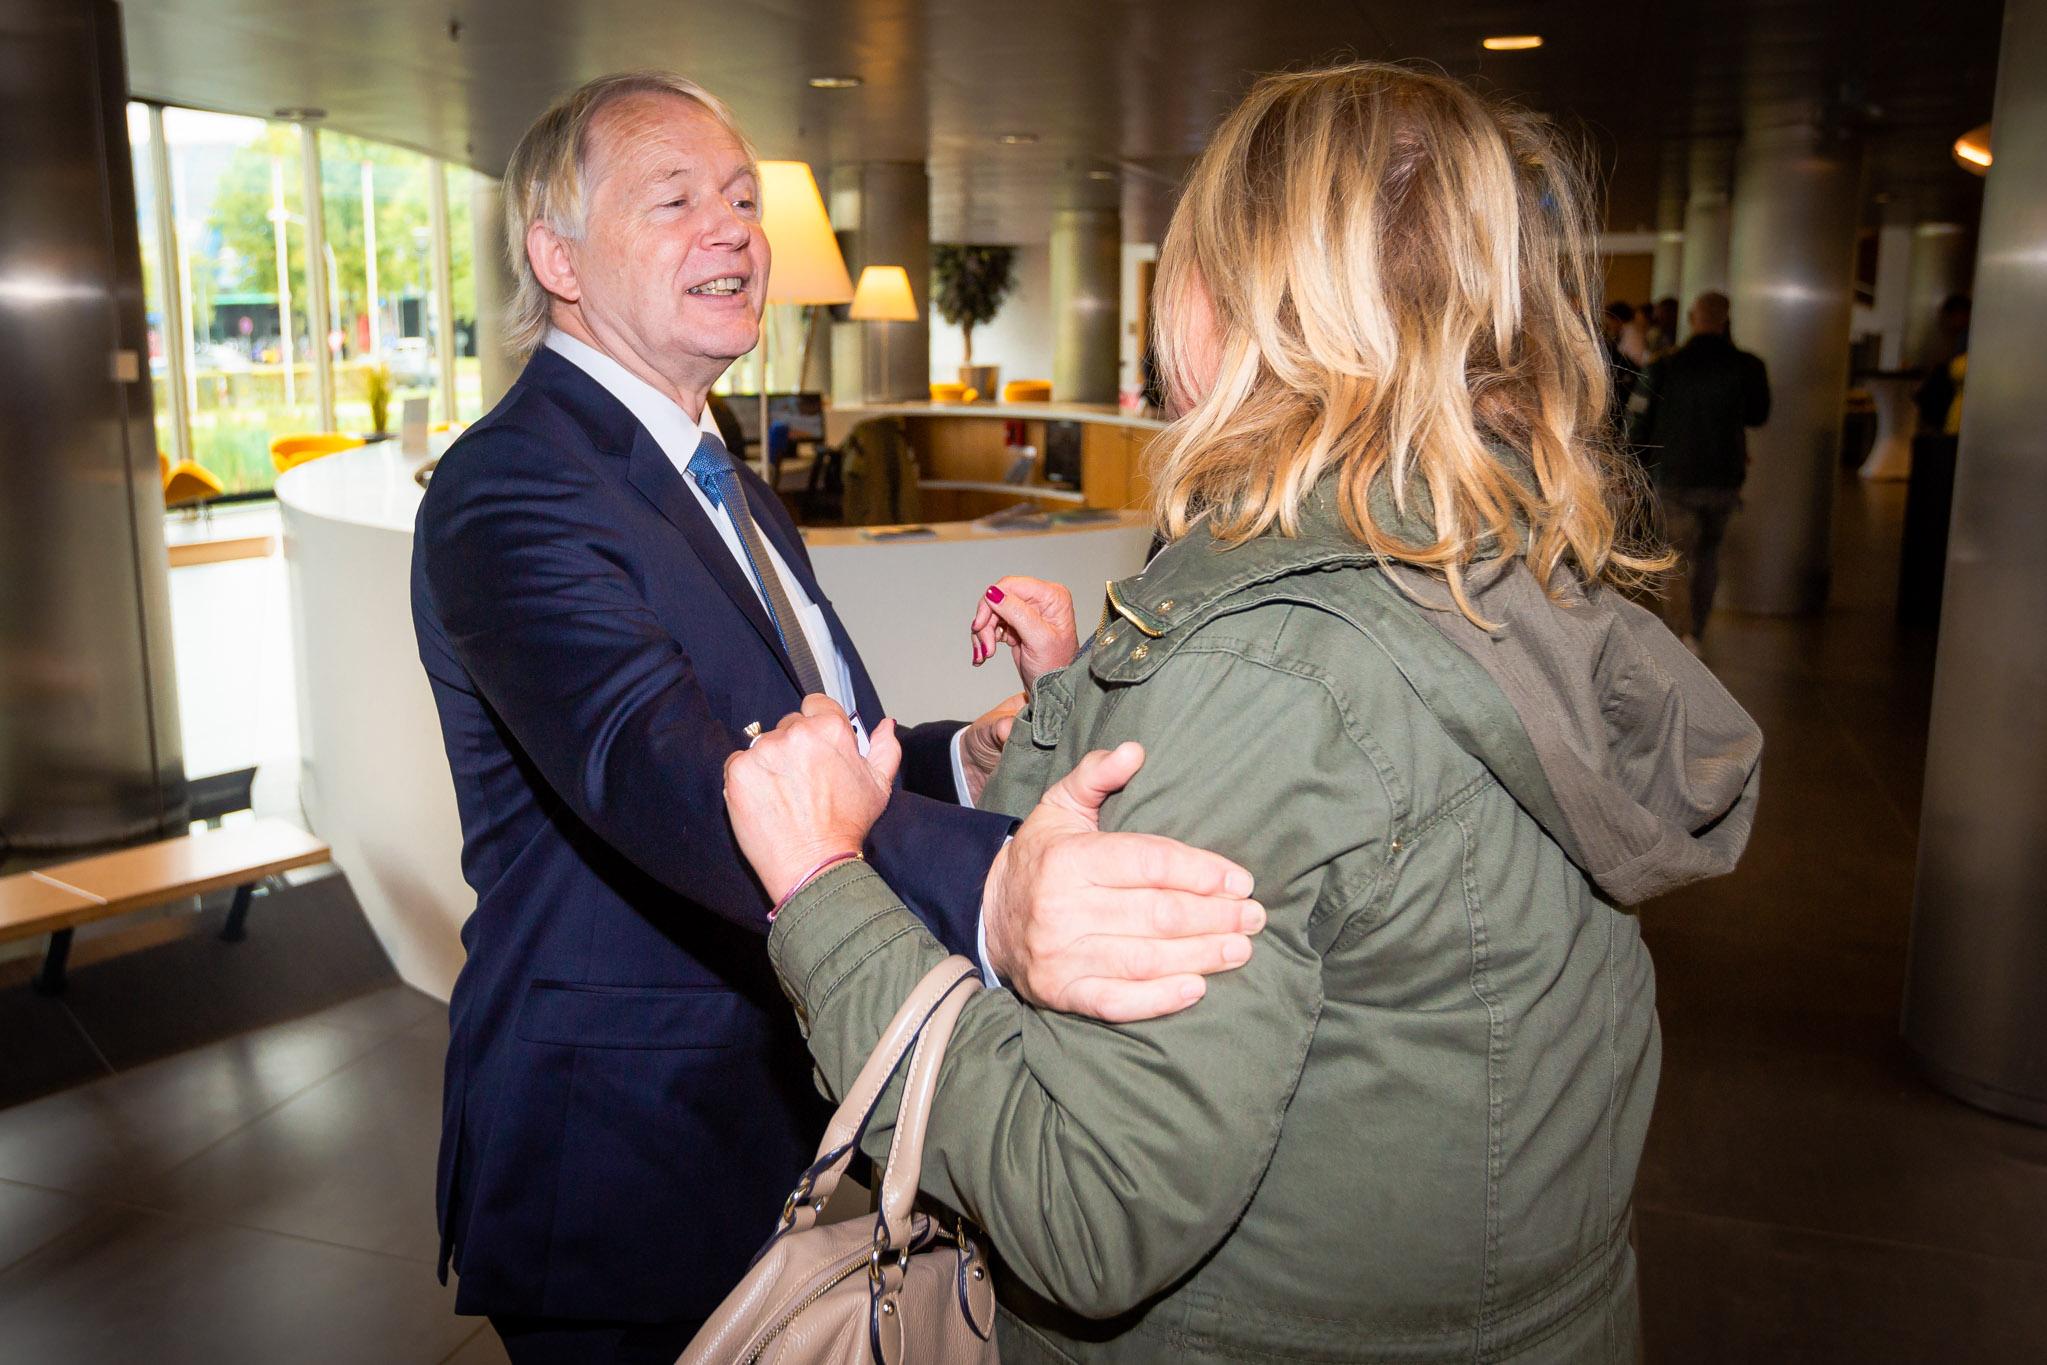 Bedrijfsreportage CMO Provincie Flevoland Reportage Fotograaf Shot By Sylla 5